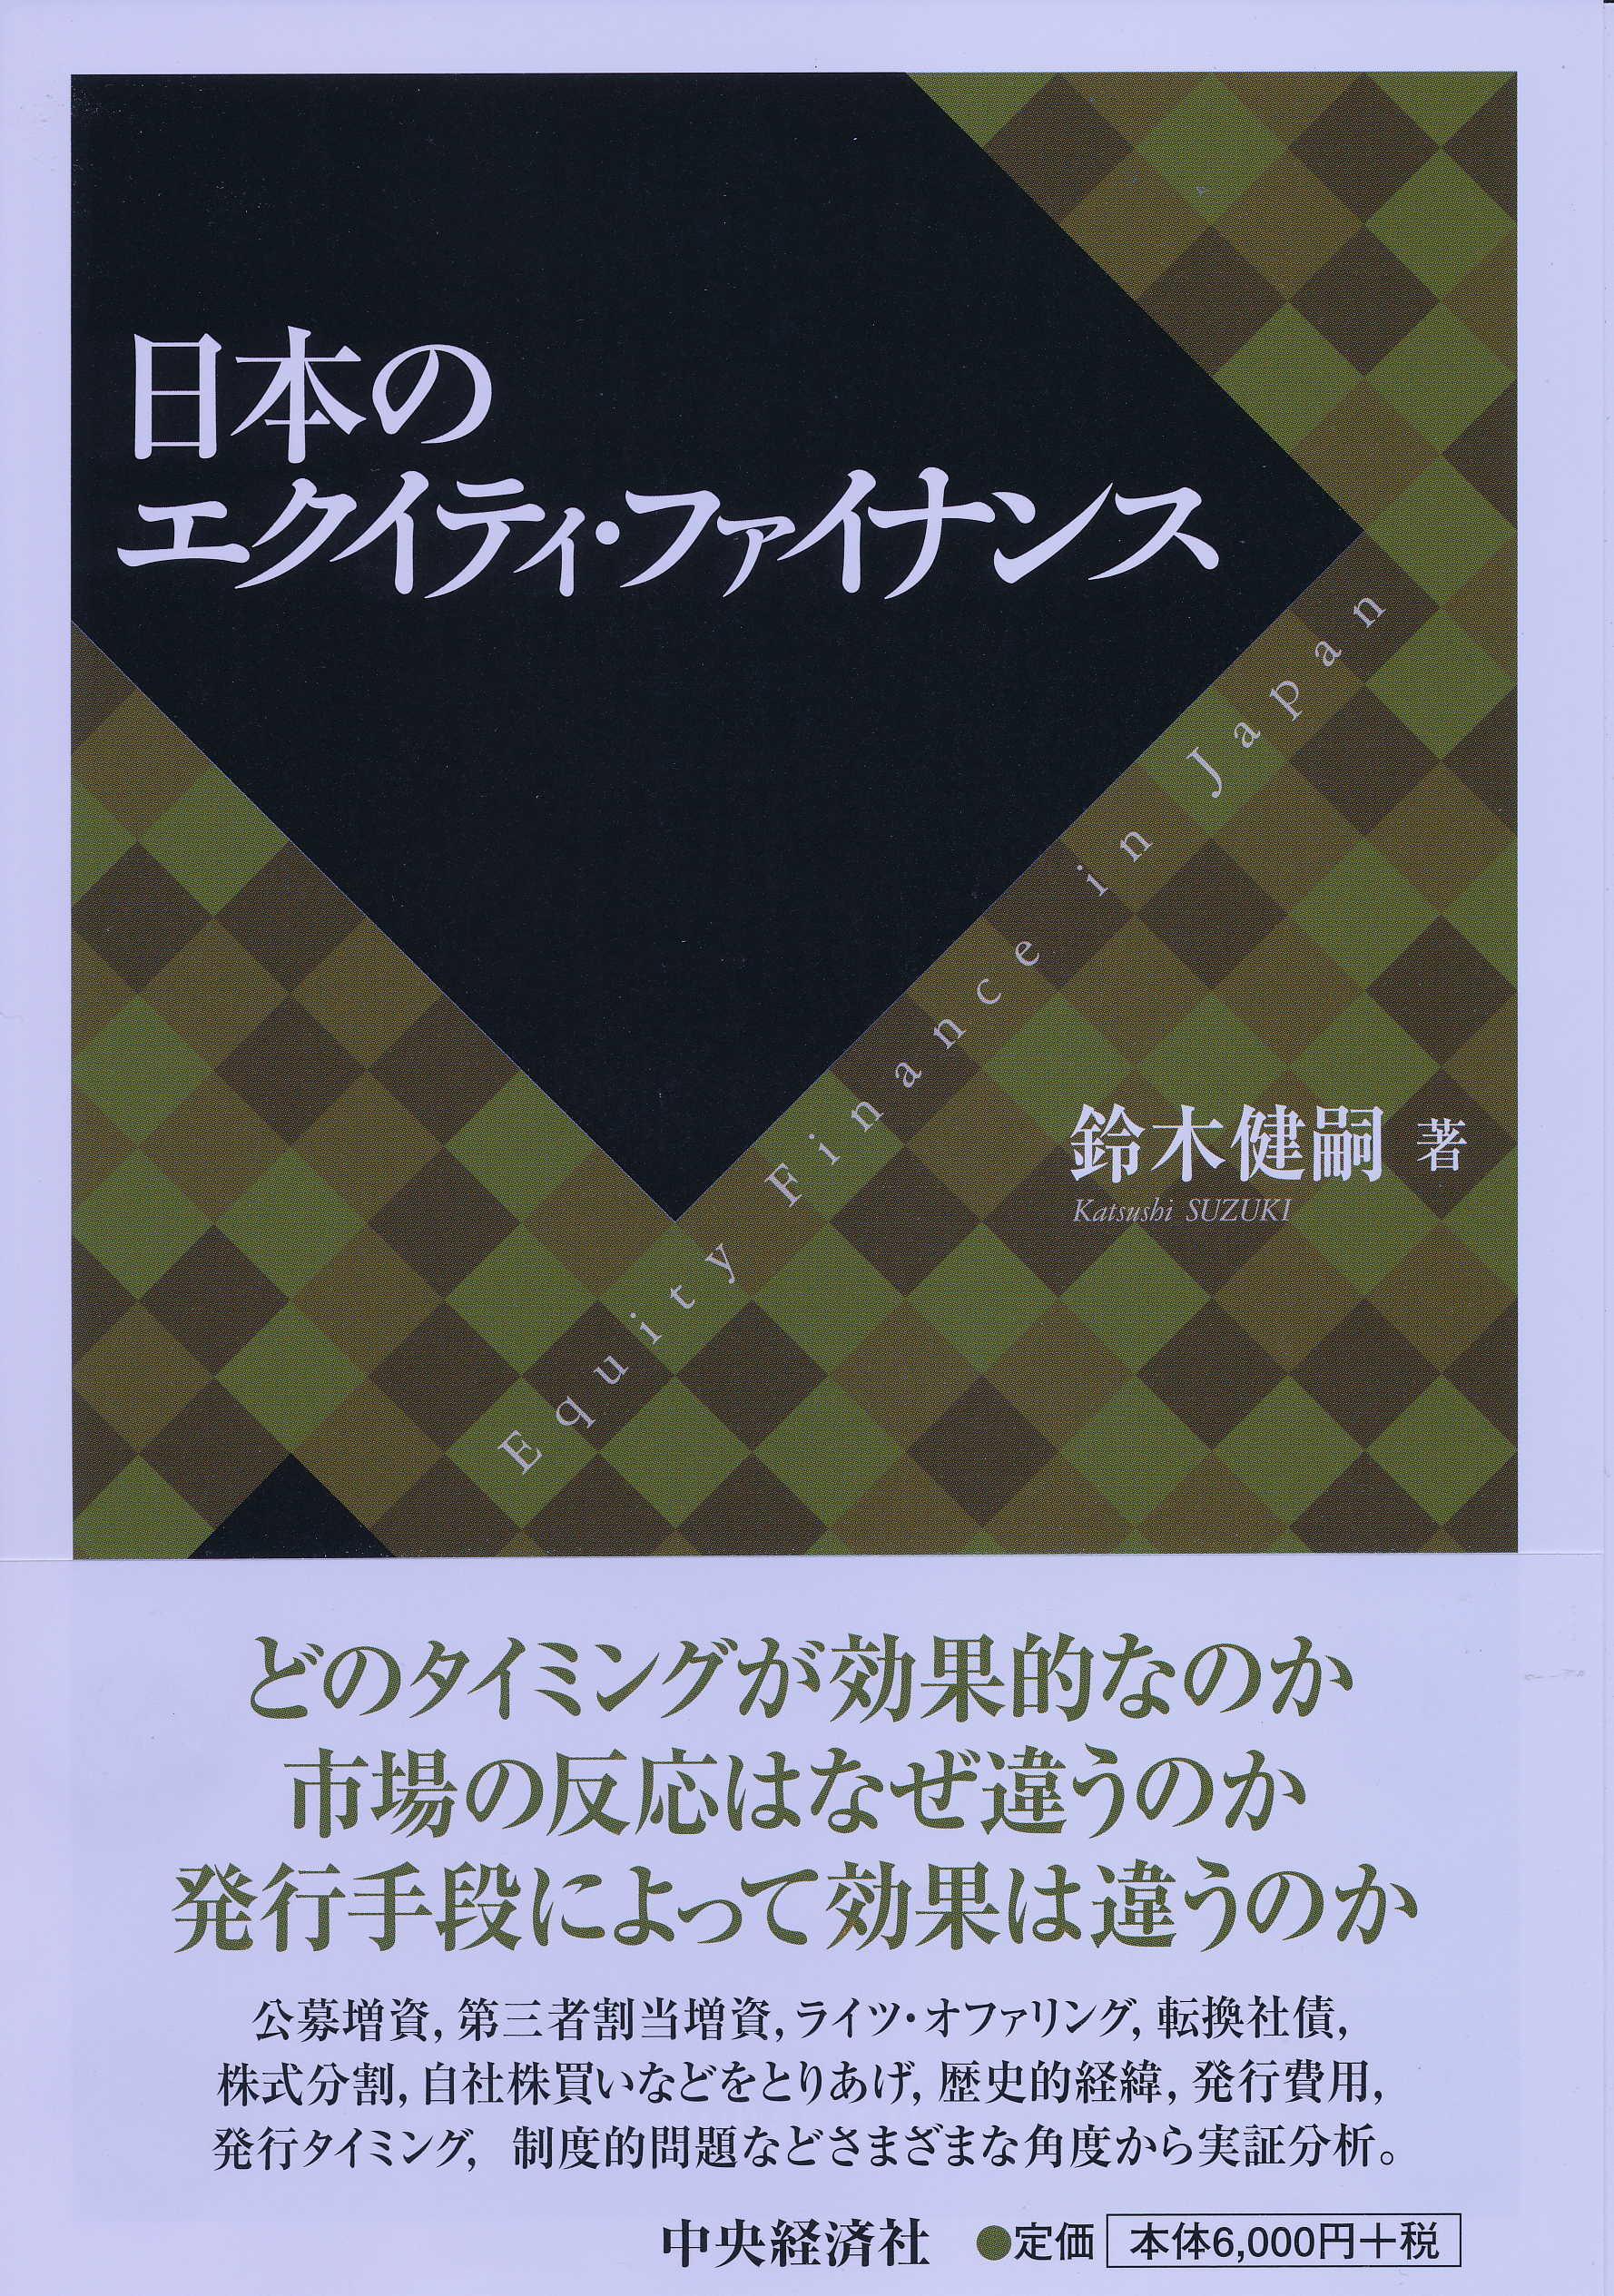 経済学部 瀨古美喜教授の著書「日本の住宅市場と …